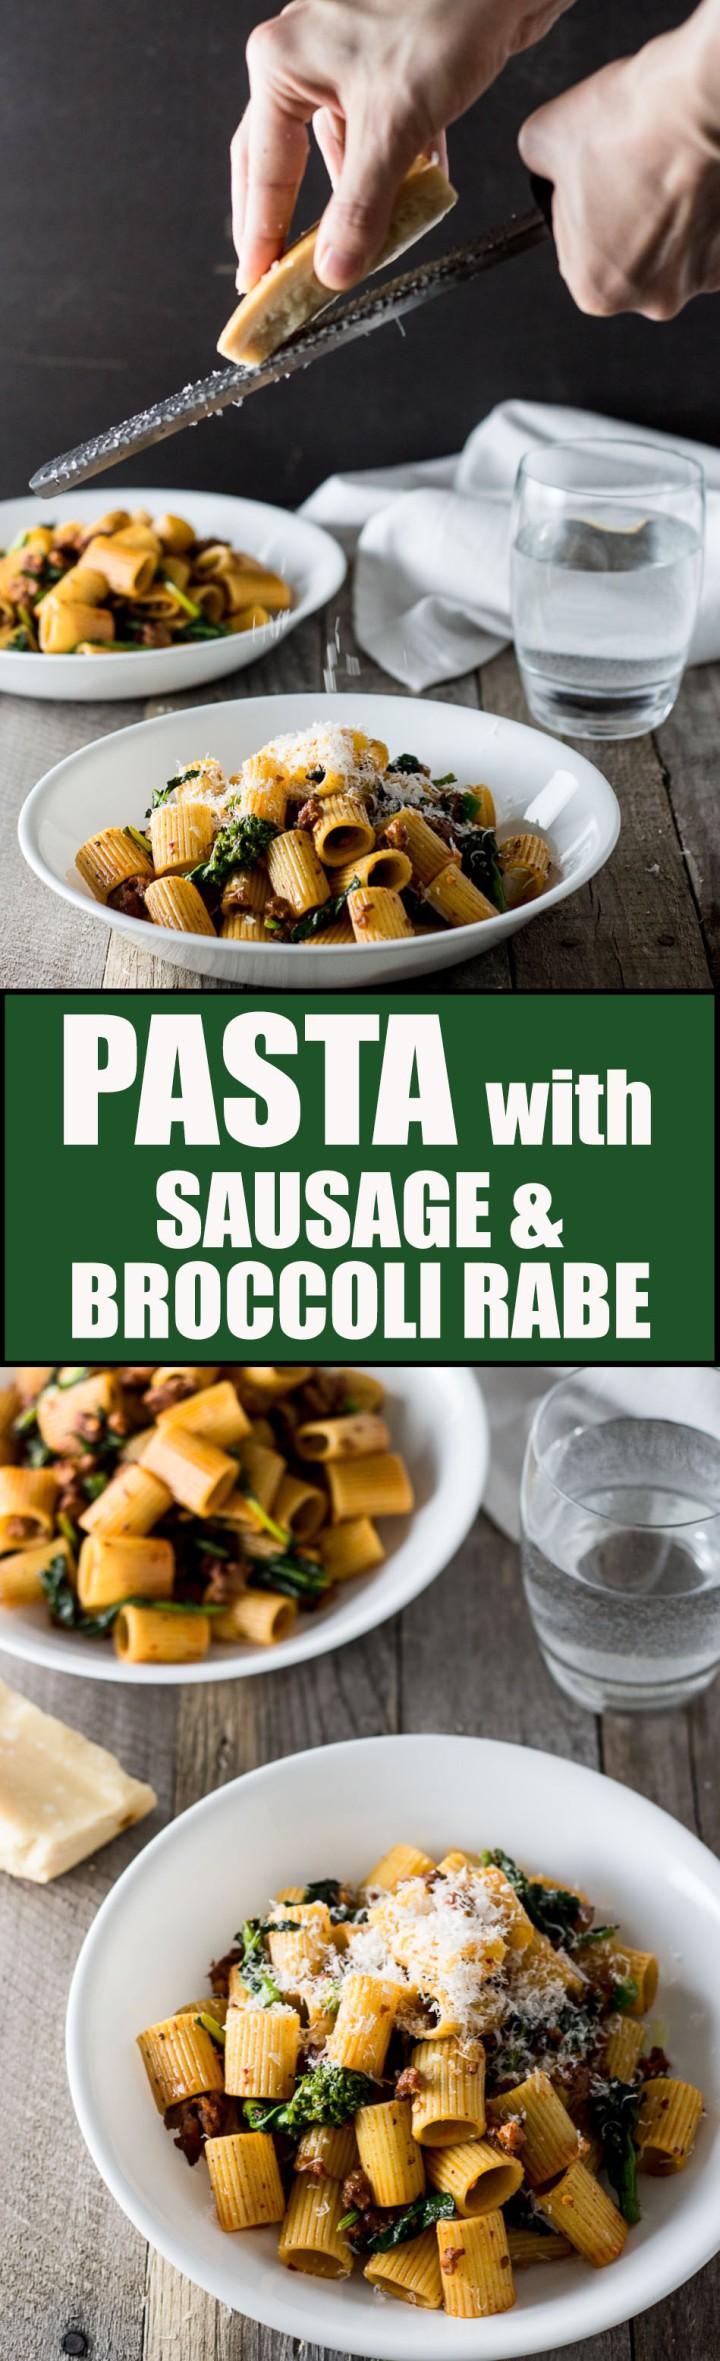 Mezzi Rigatoni with Sausage & Broccoli Rabe